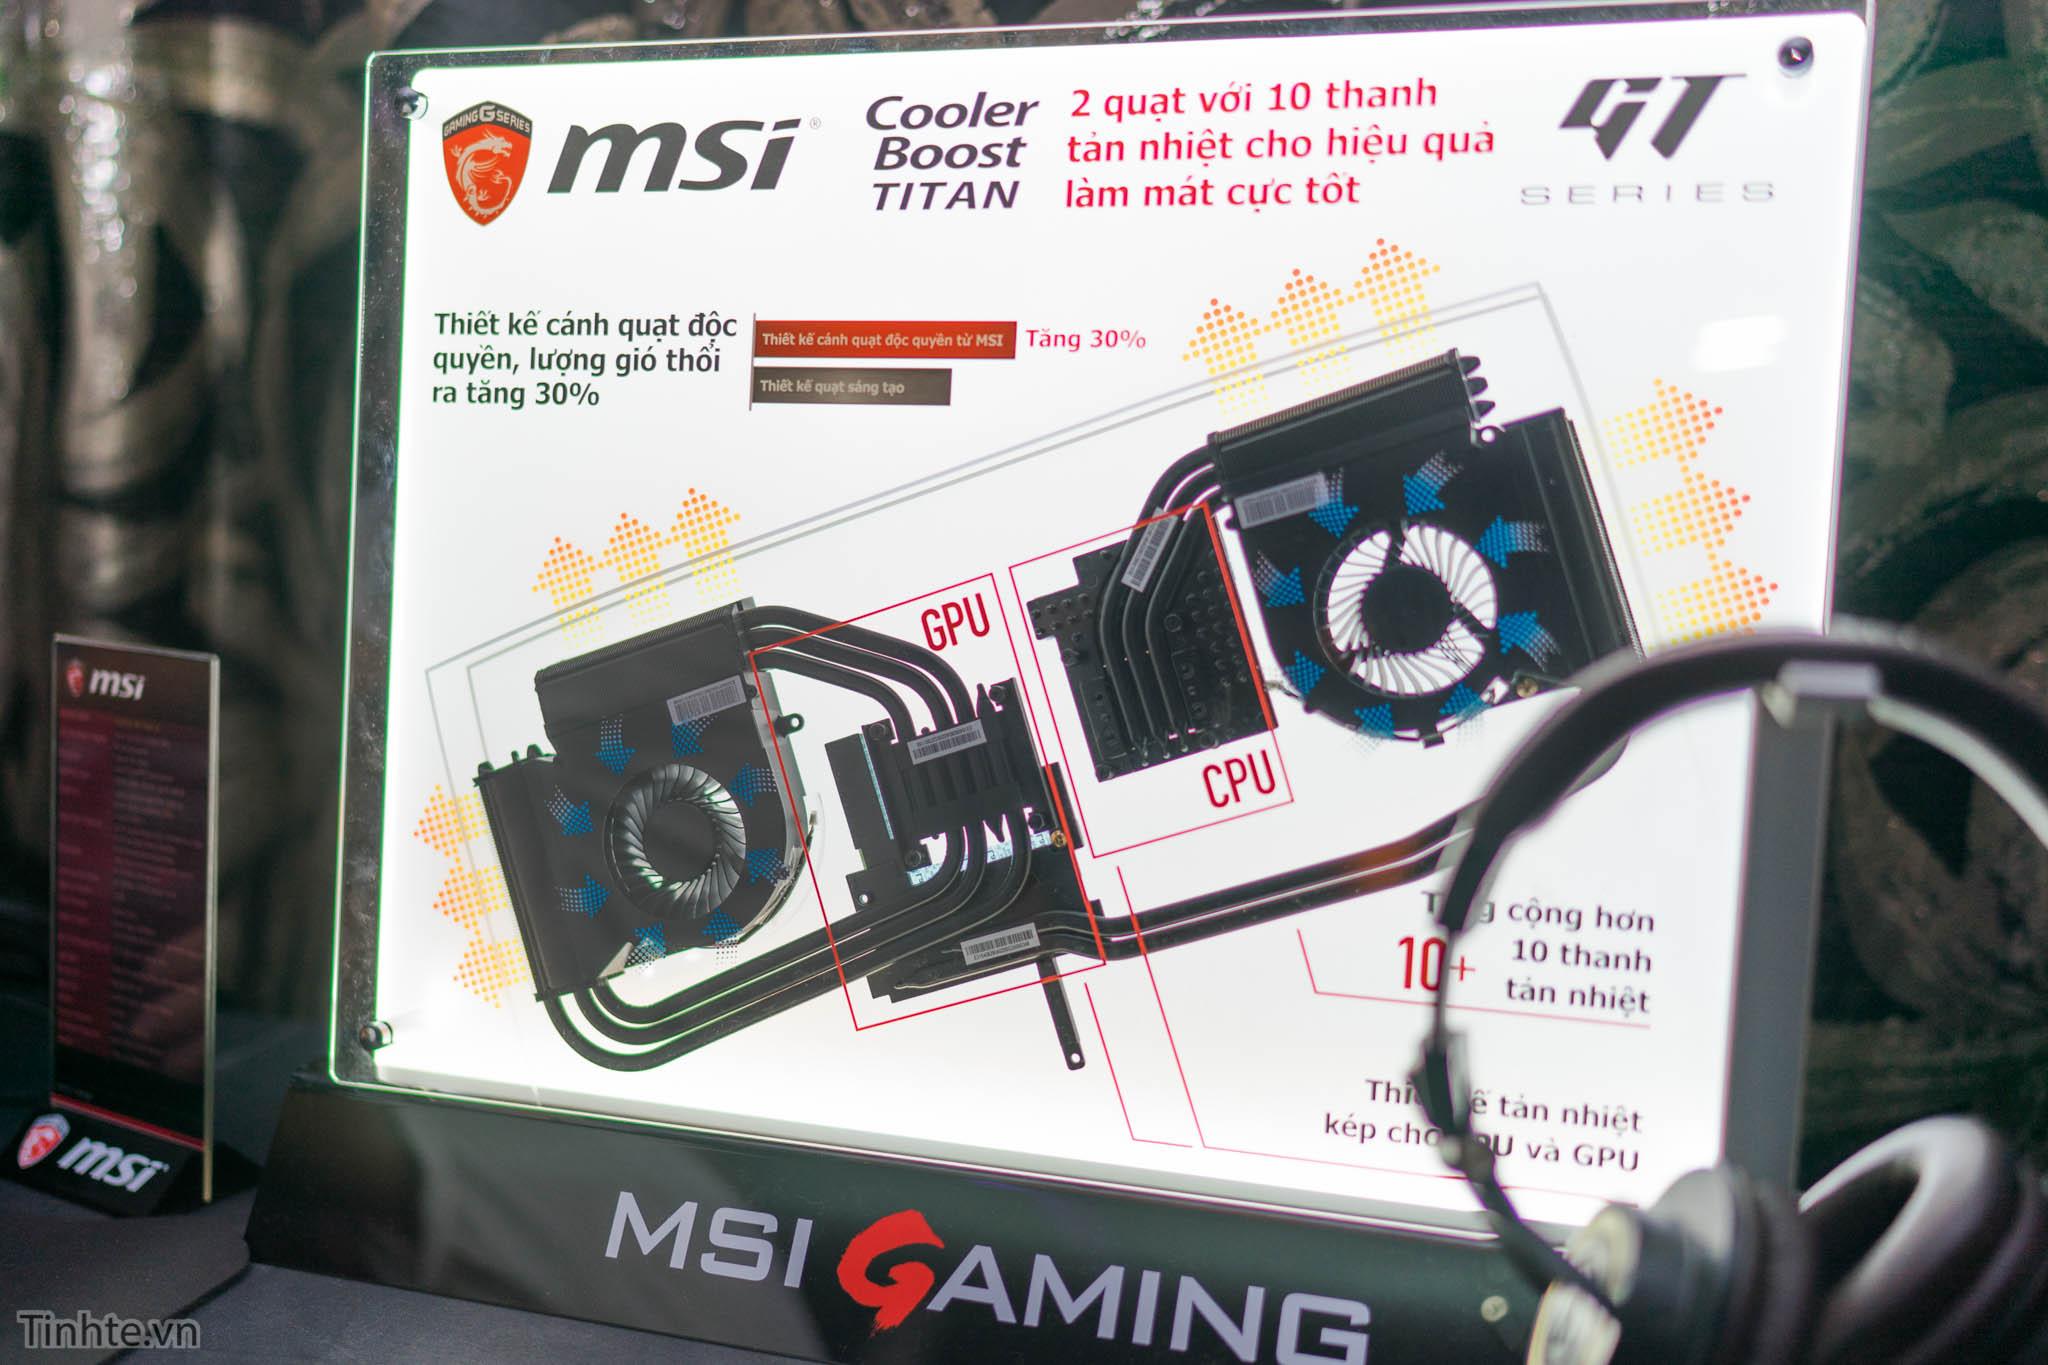 MSI_laptop-9.jpg